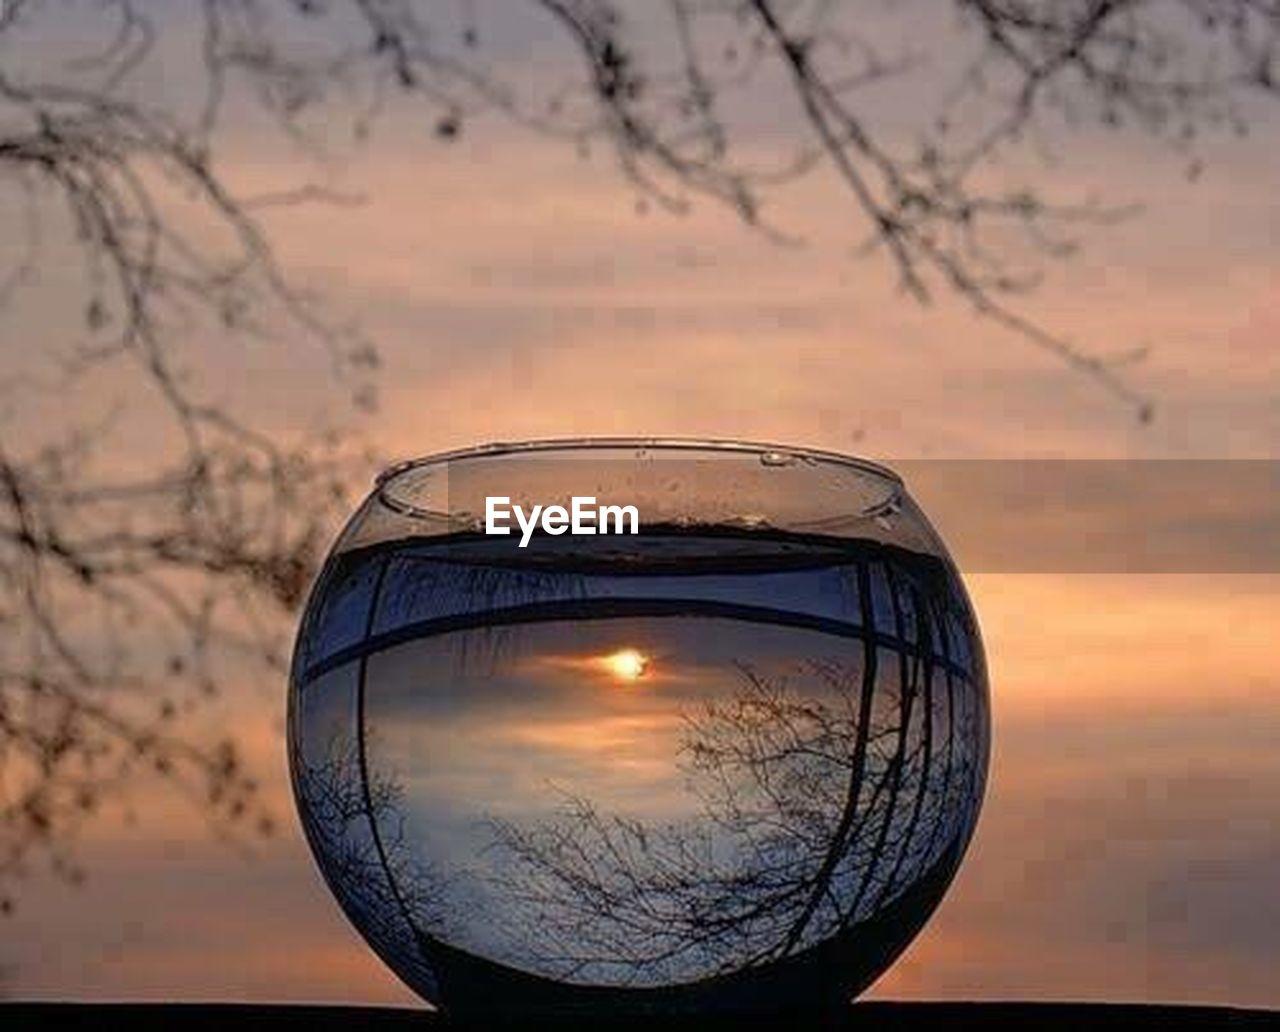 sunset, sky, reflection, dusk, no people, scenics, nature, outdoors, bare tree, landscape, beauty in nature, close-up, illuminated, tree, day